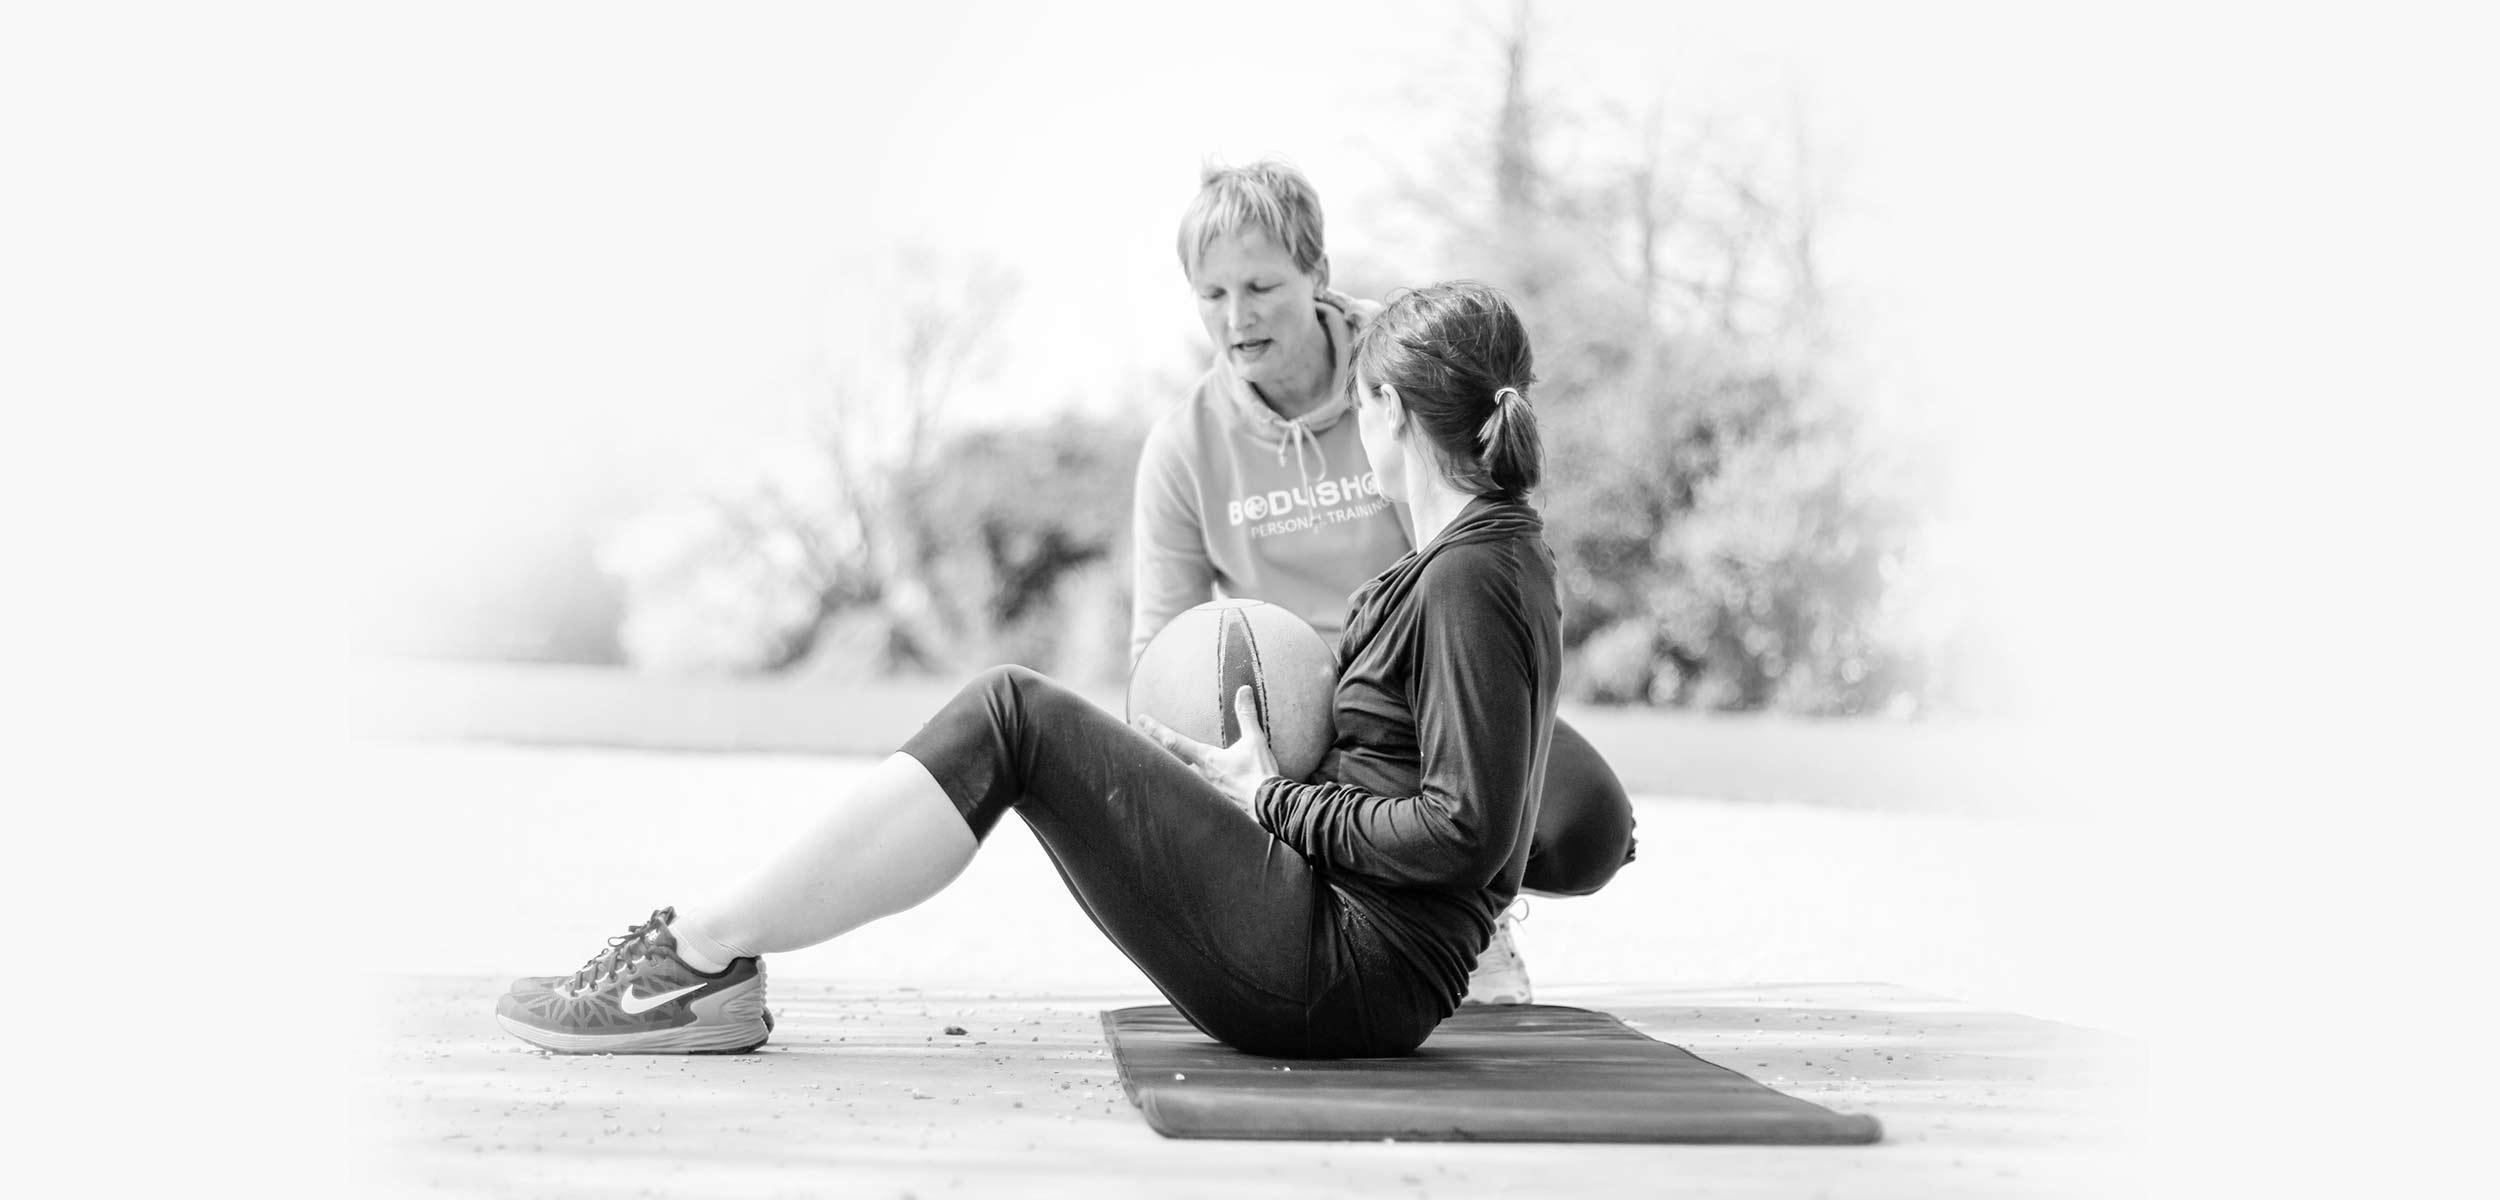 bodyshot-bodyshotperformance-personaltraining-fitnesscoaching-dna-genetics-diet-fitness-exercise-exercisemyths-mythsdebunked-strength-health-muscle-fat